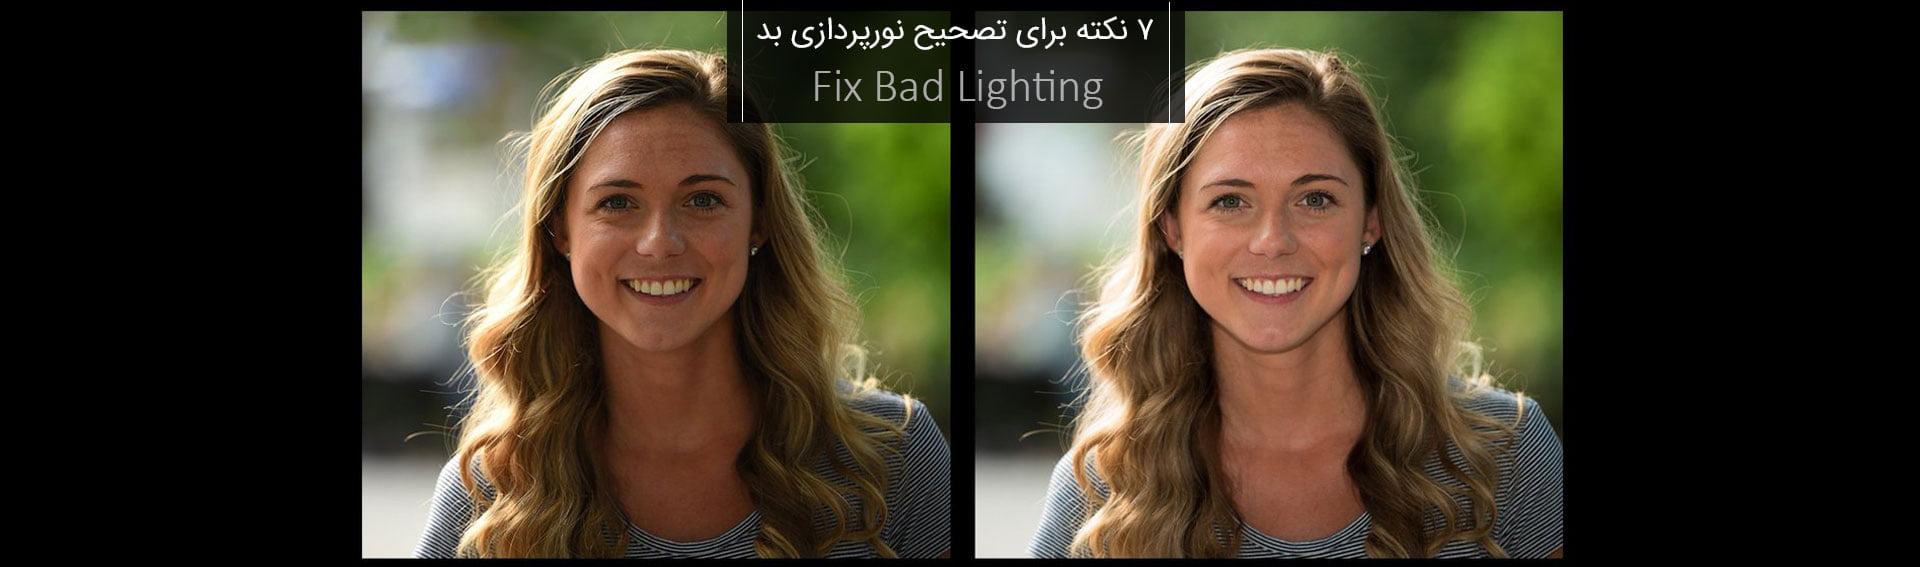 akasi bad lighting1 - 7 نکته برای تصحیح نورپردازی در عکاسی